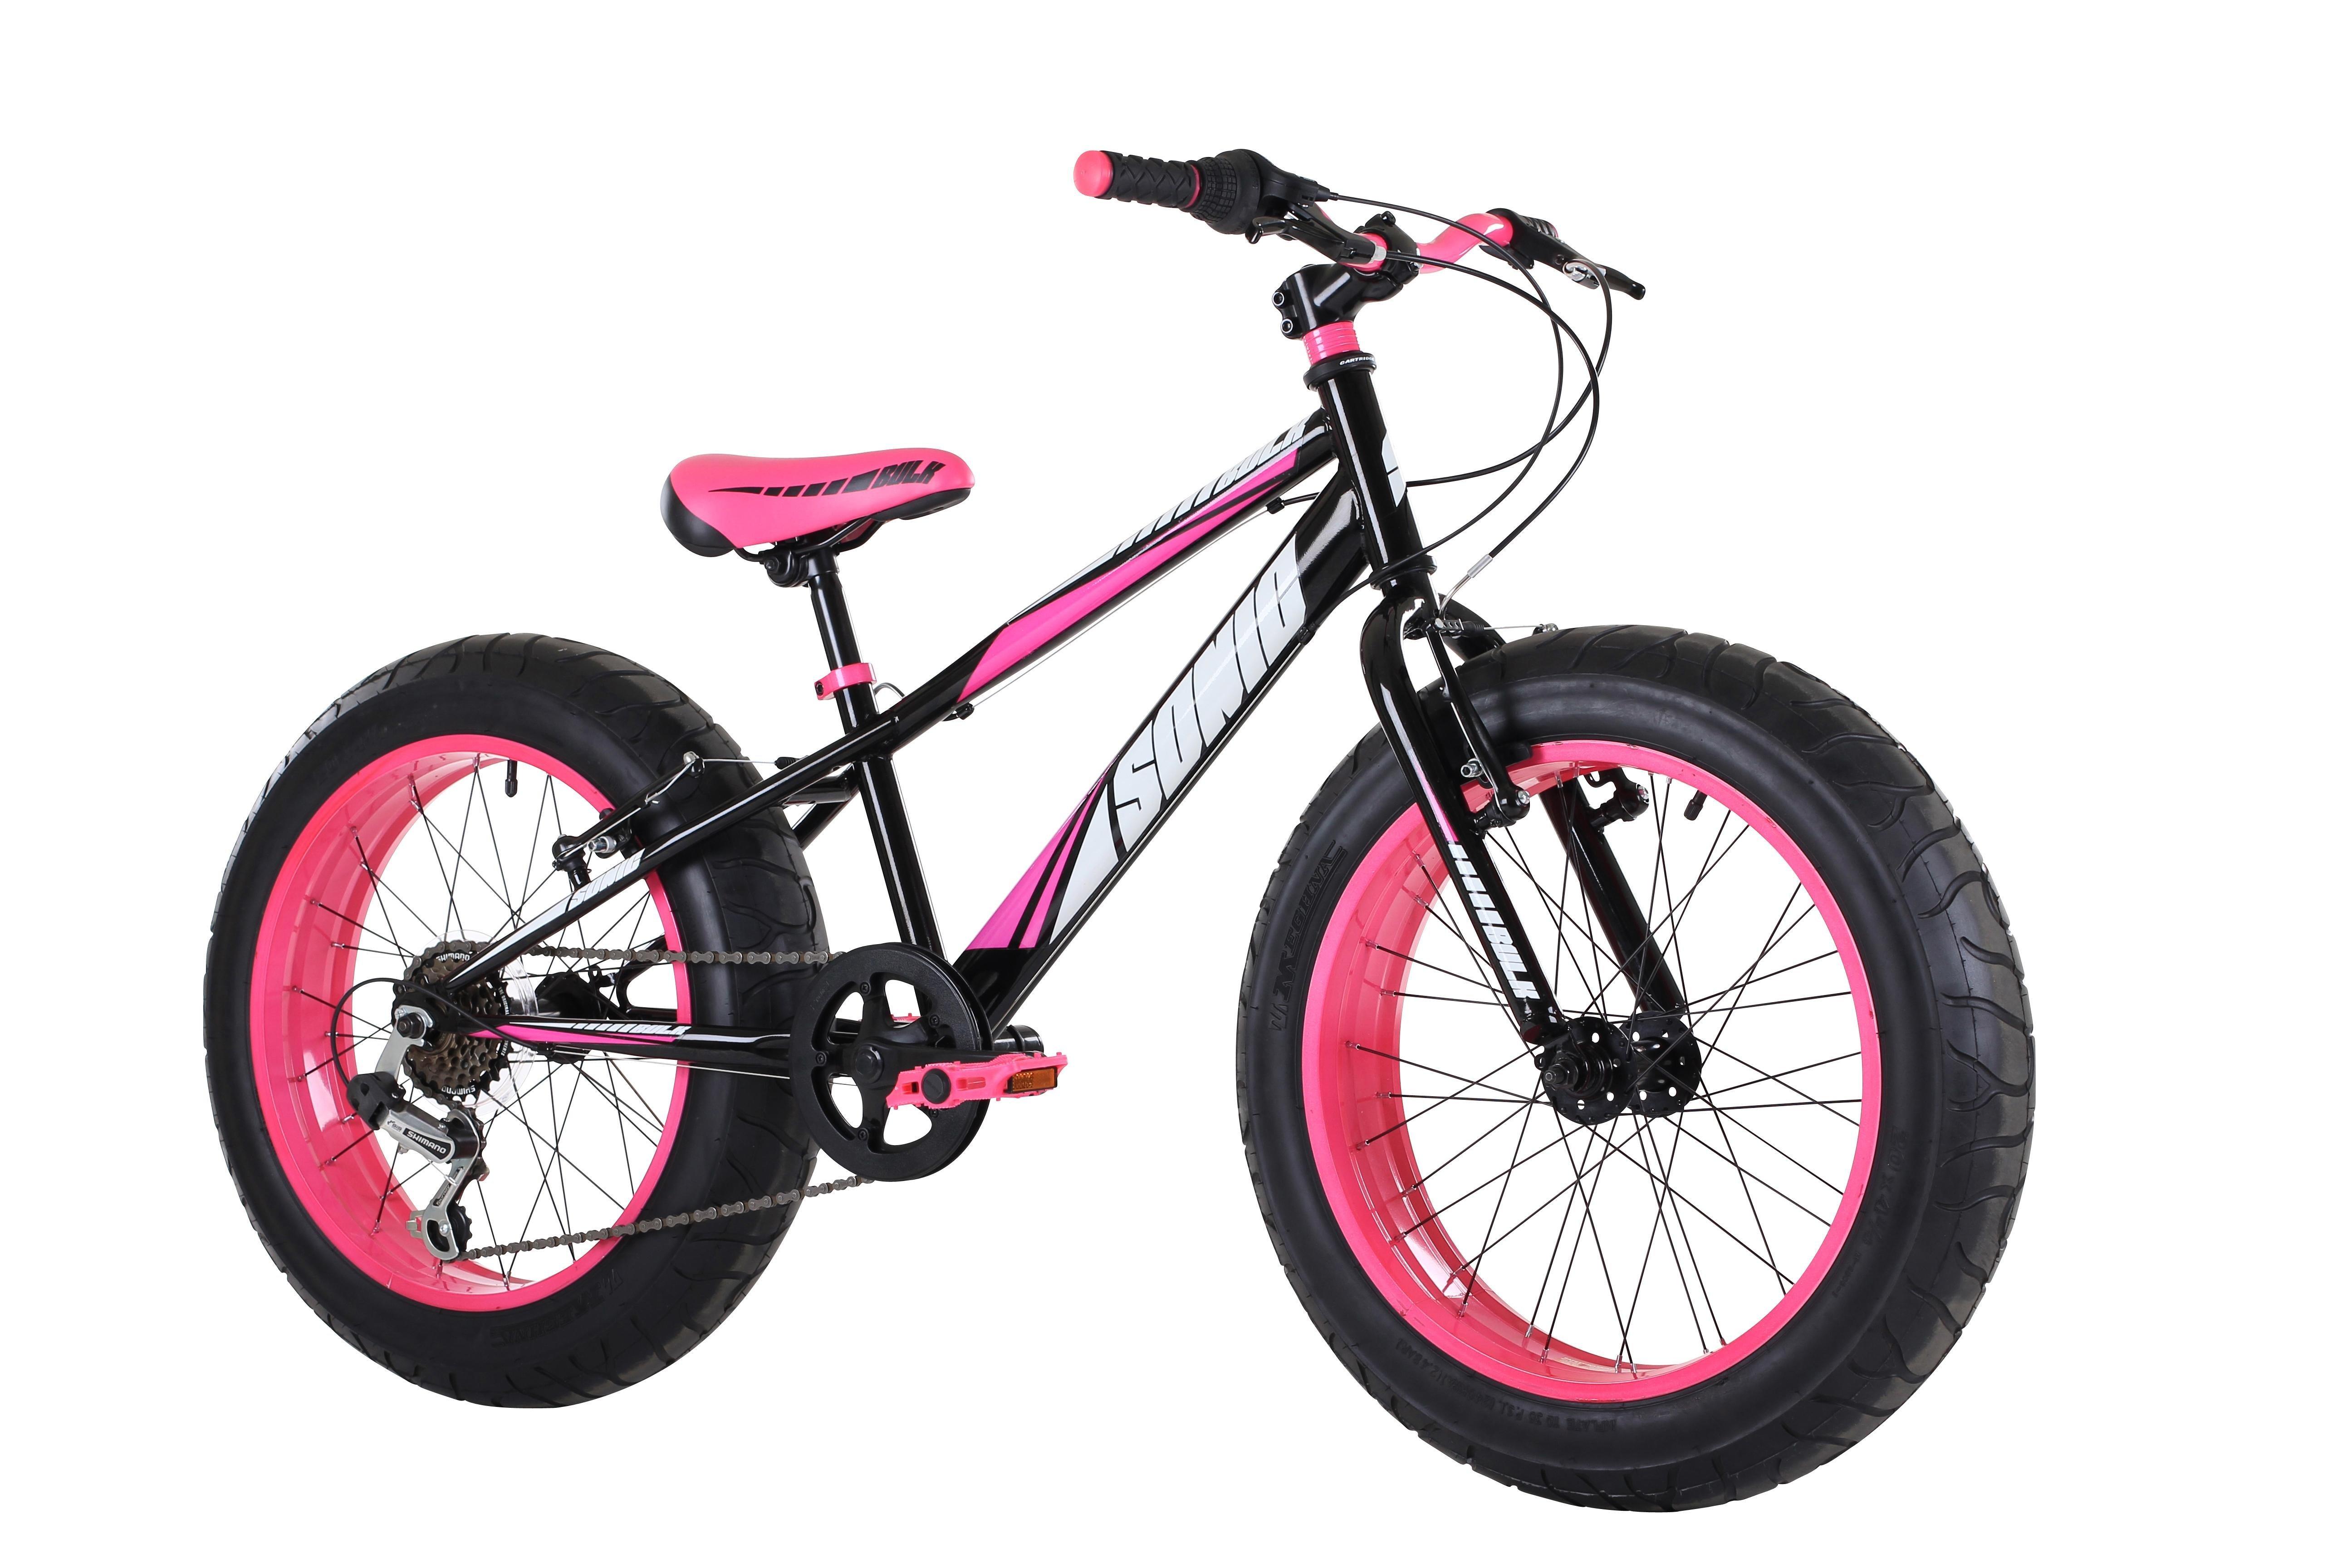 f0875df8a2765e Sonic Bulk kid's Fat Bike - Vivid Pink: Amazon.co.uk: Sports & Outdoors